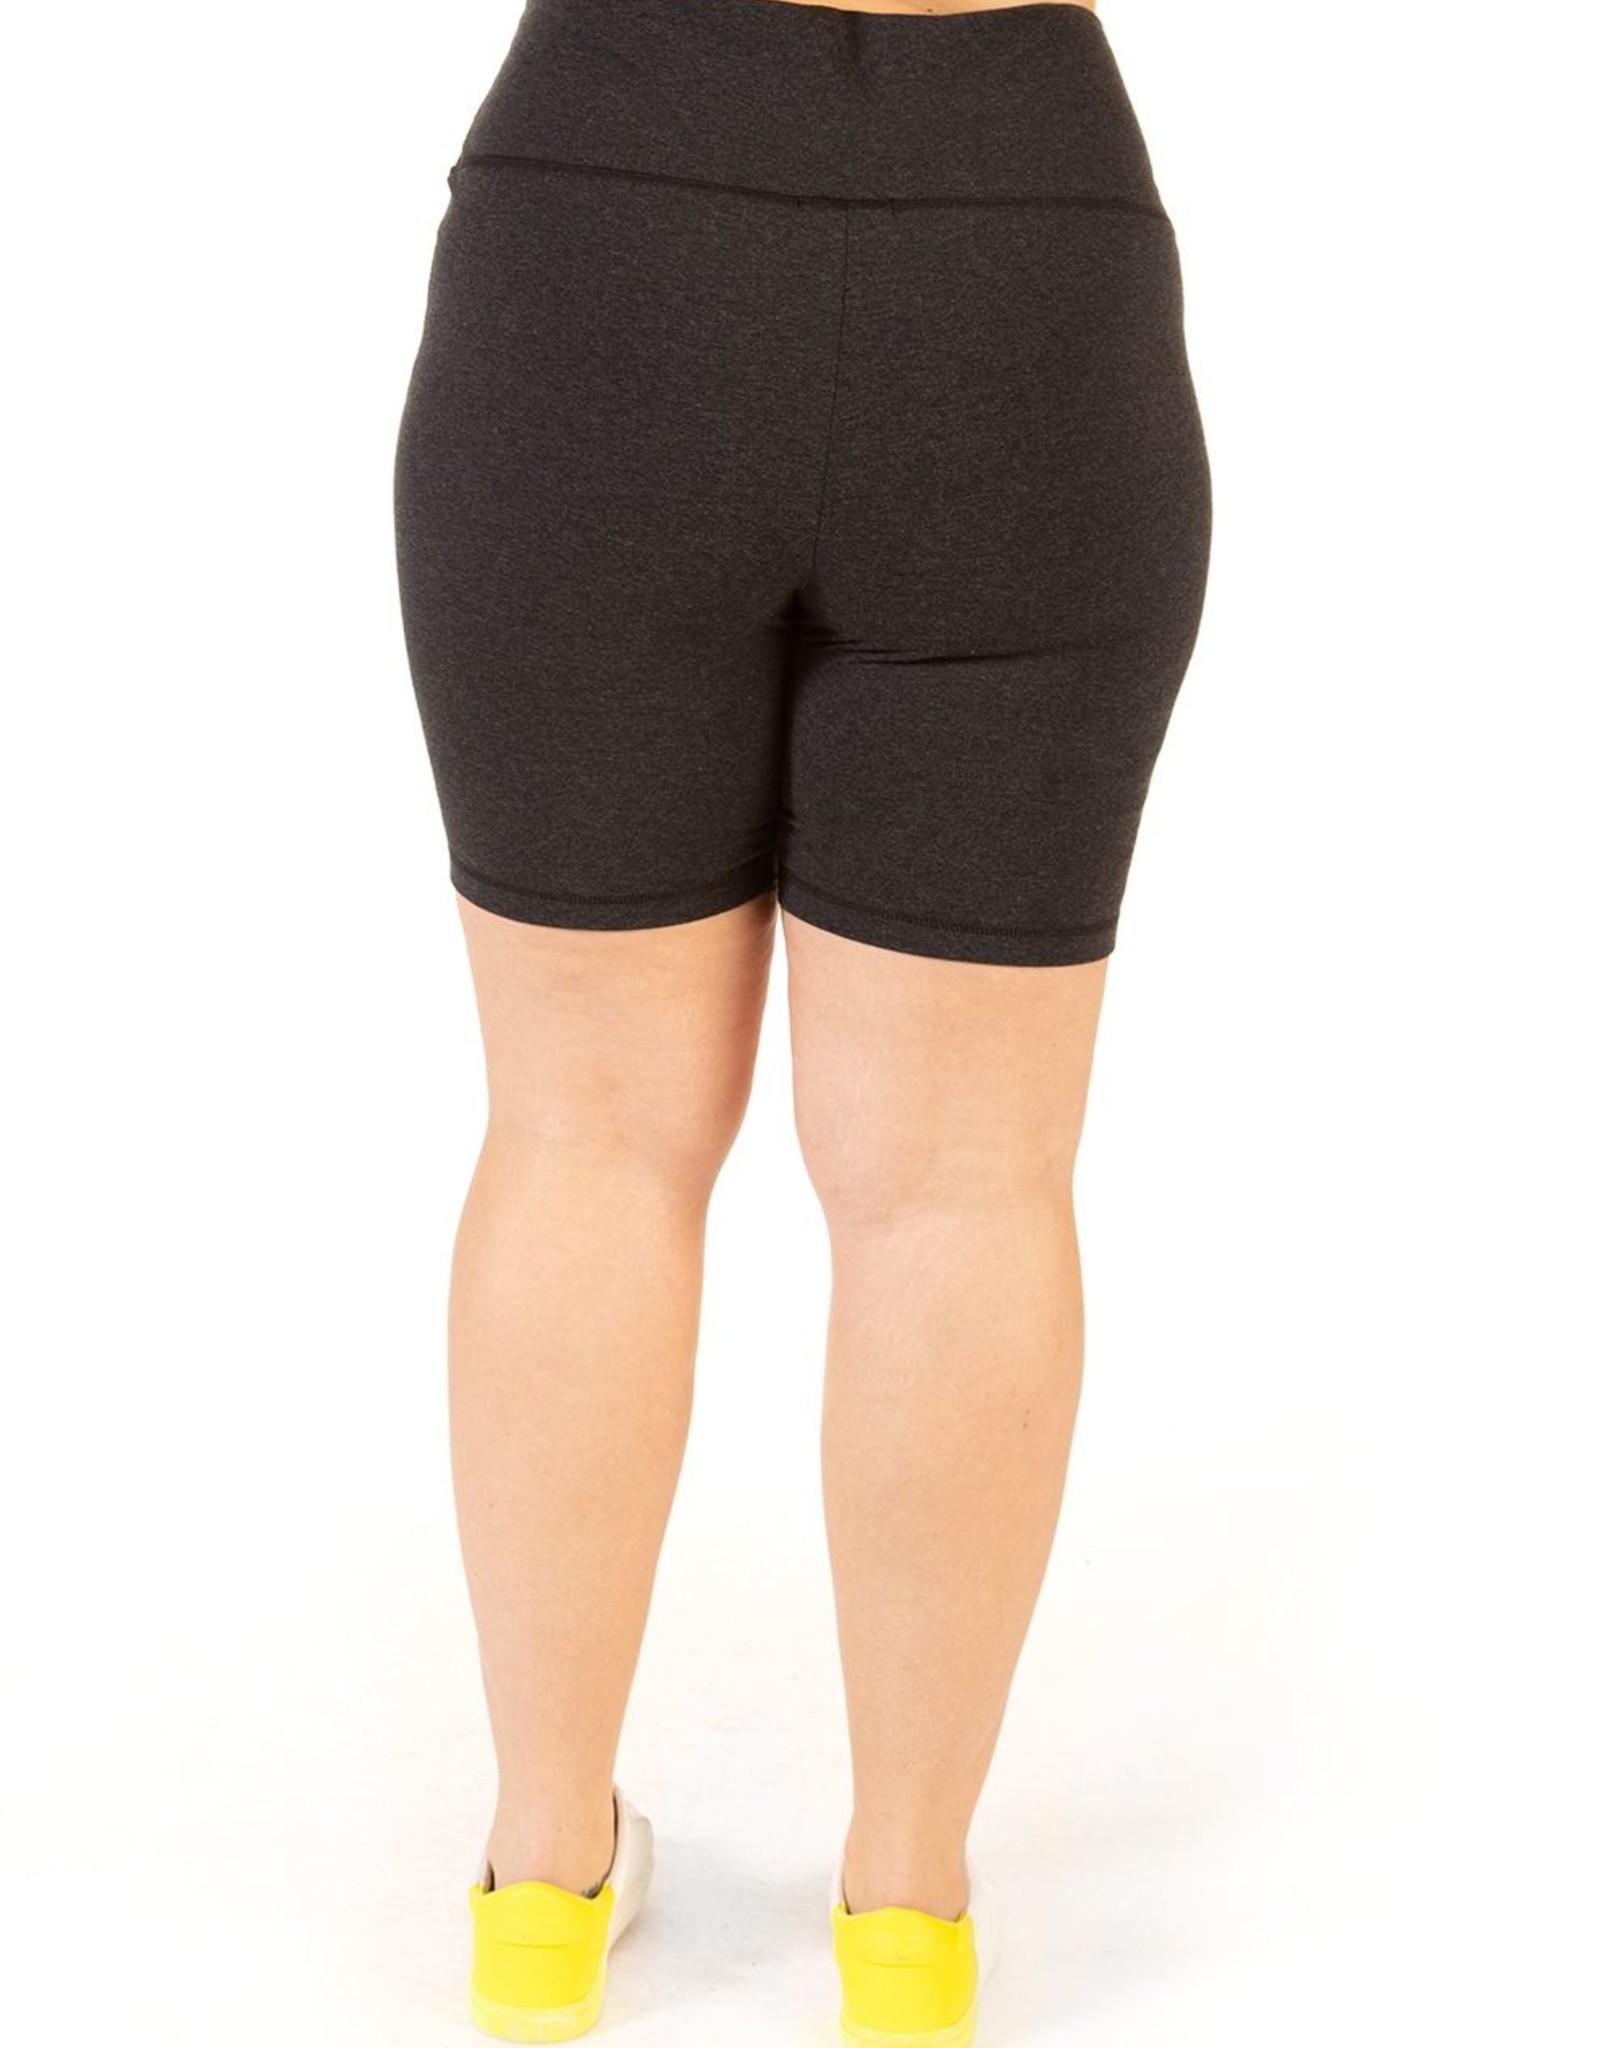 Dex Charcoal Biker Shorts Plus